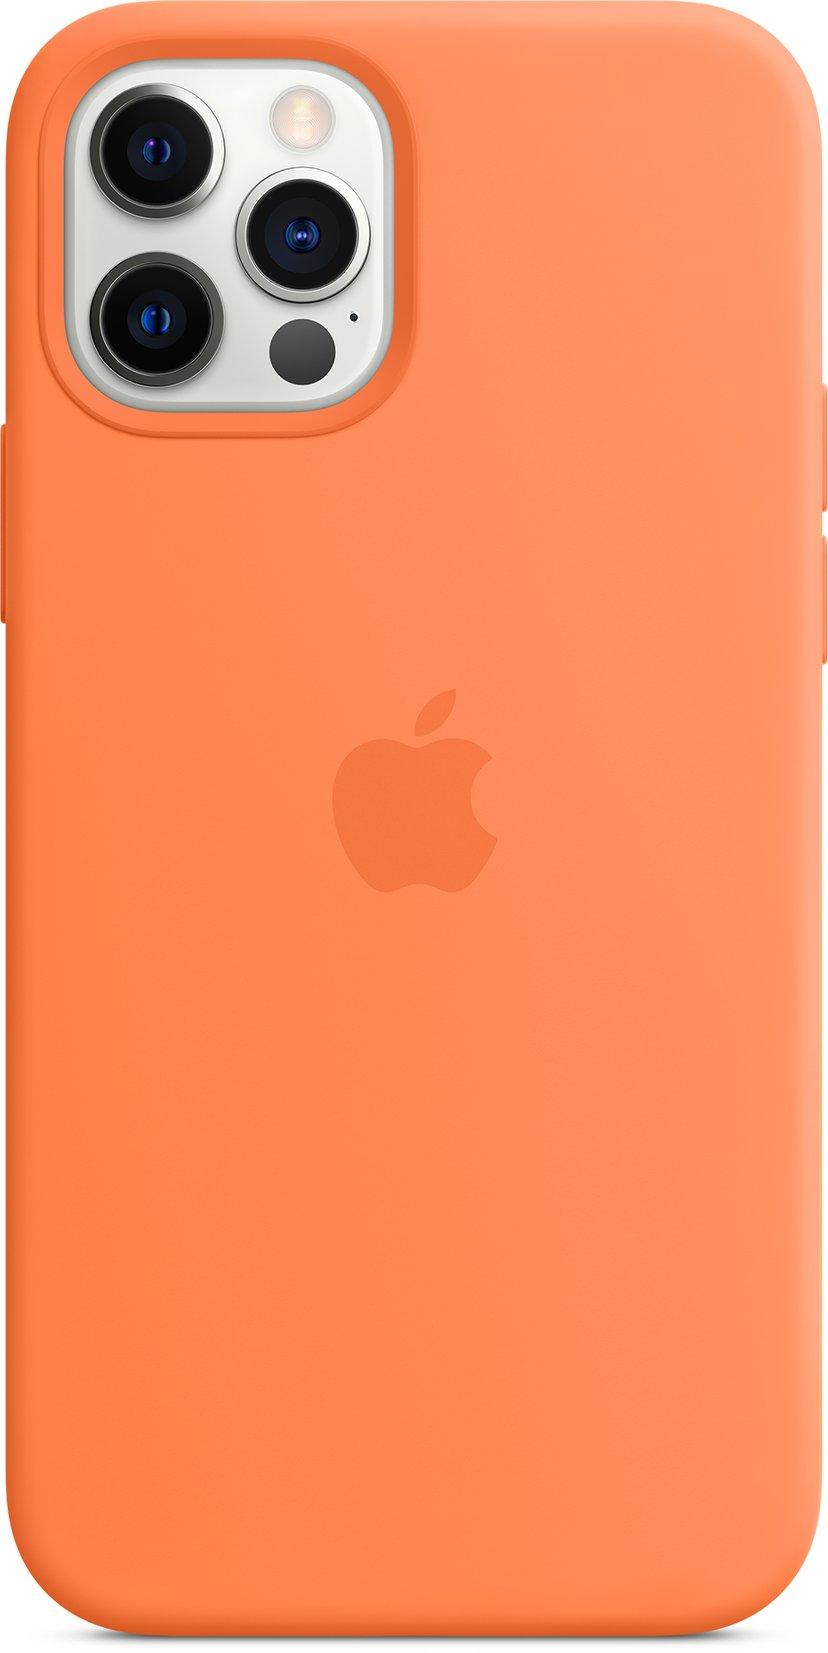 Apple Silicon Case with MagSafe iPhone 12, iPhone 12 Pro Kumquat